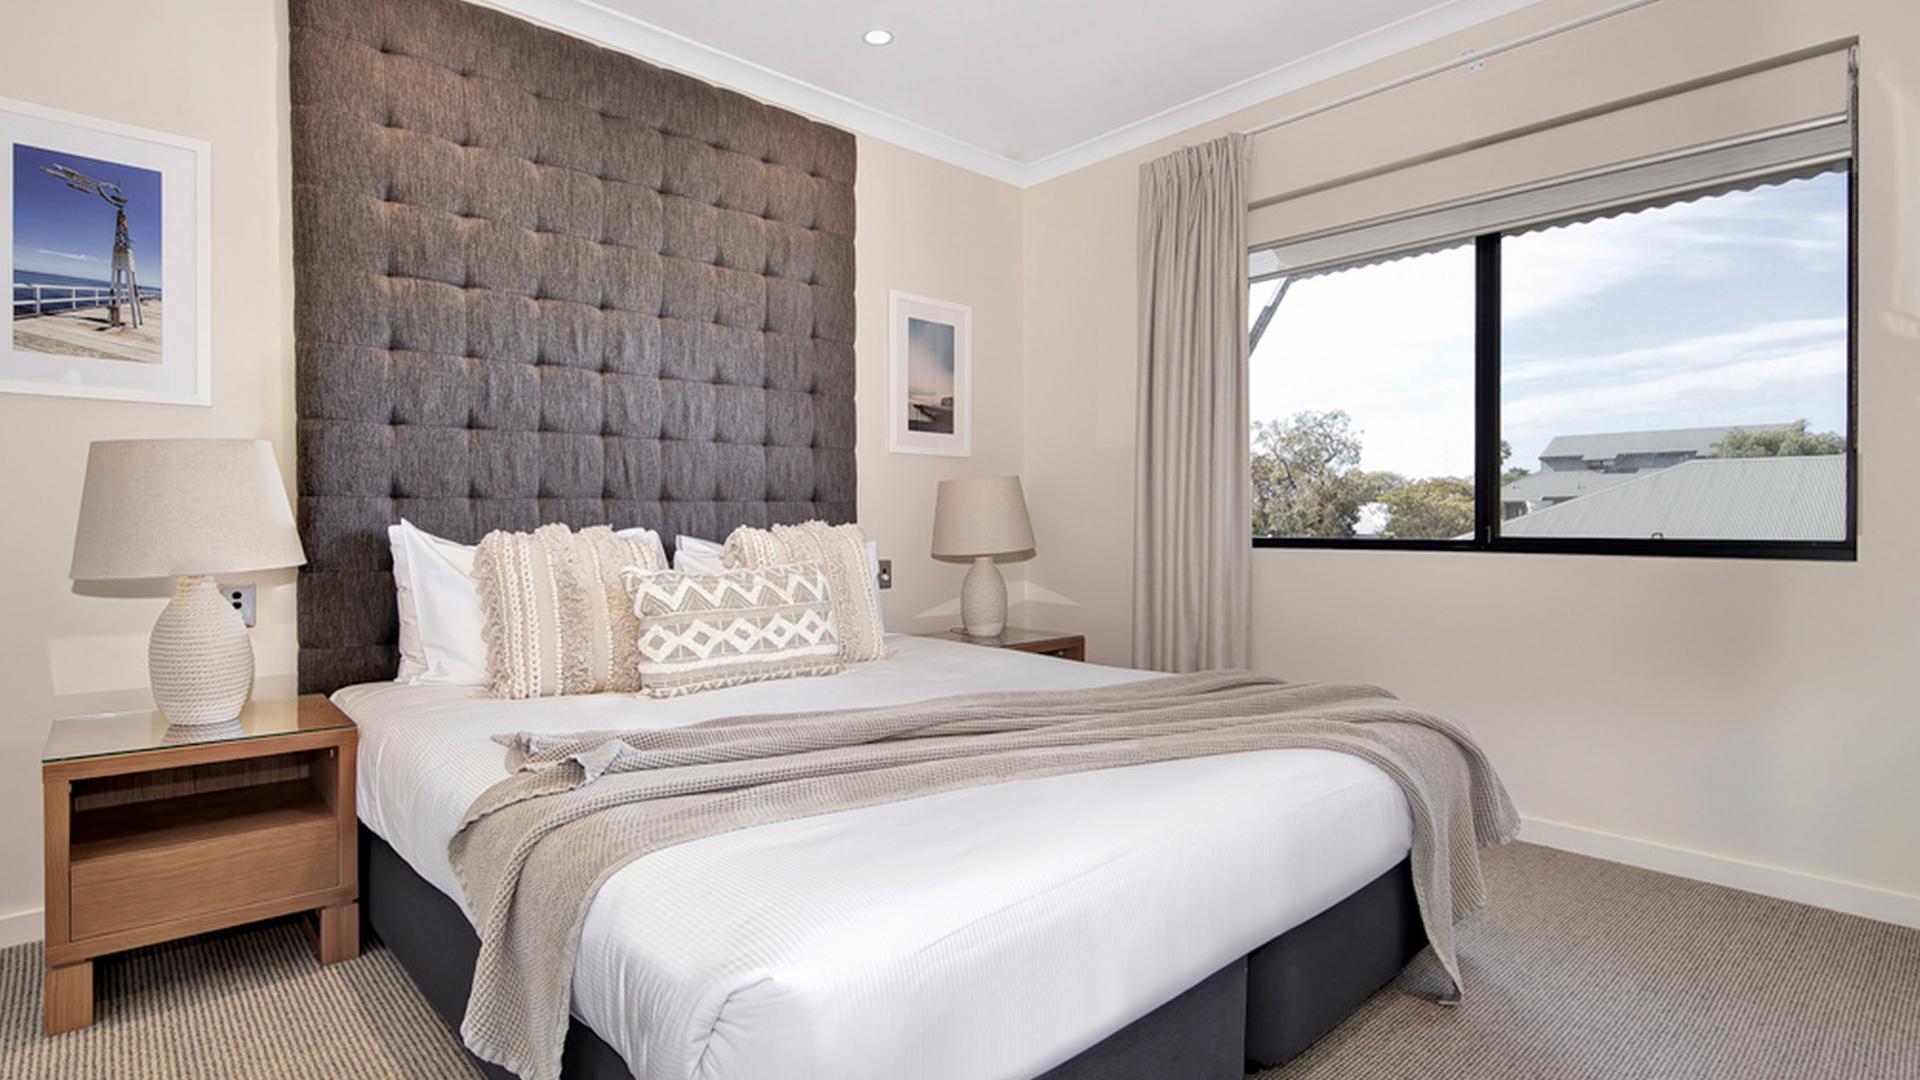 Three-Bedroom Apartment  image 1 at The Sebel Busselton by City of Busselton, Western Australia, Australia